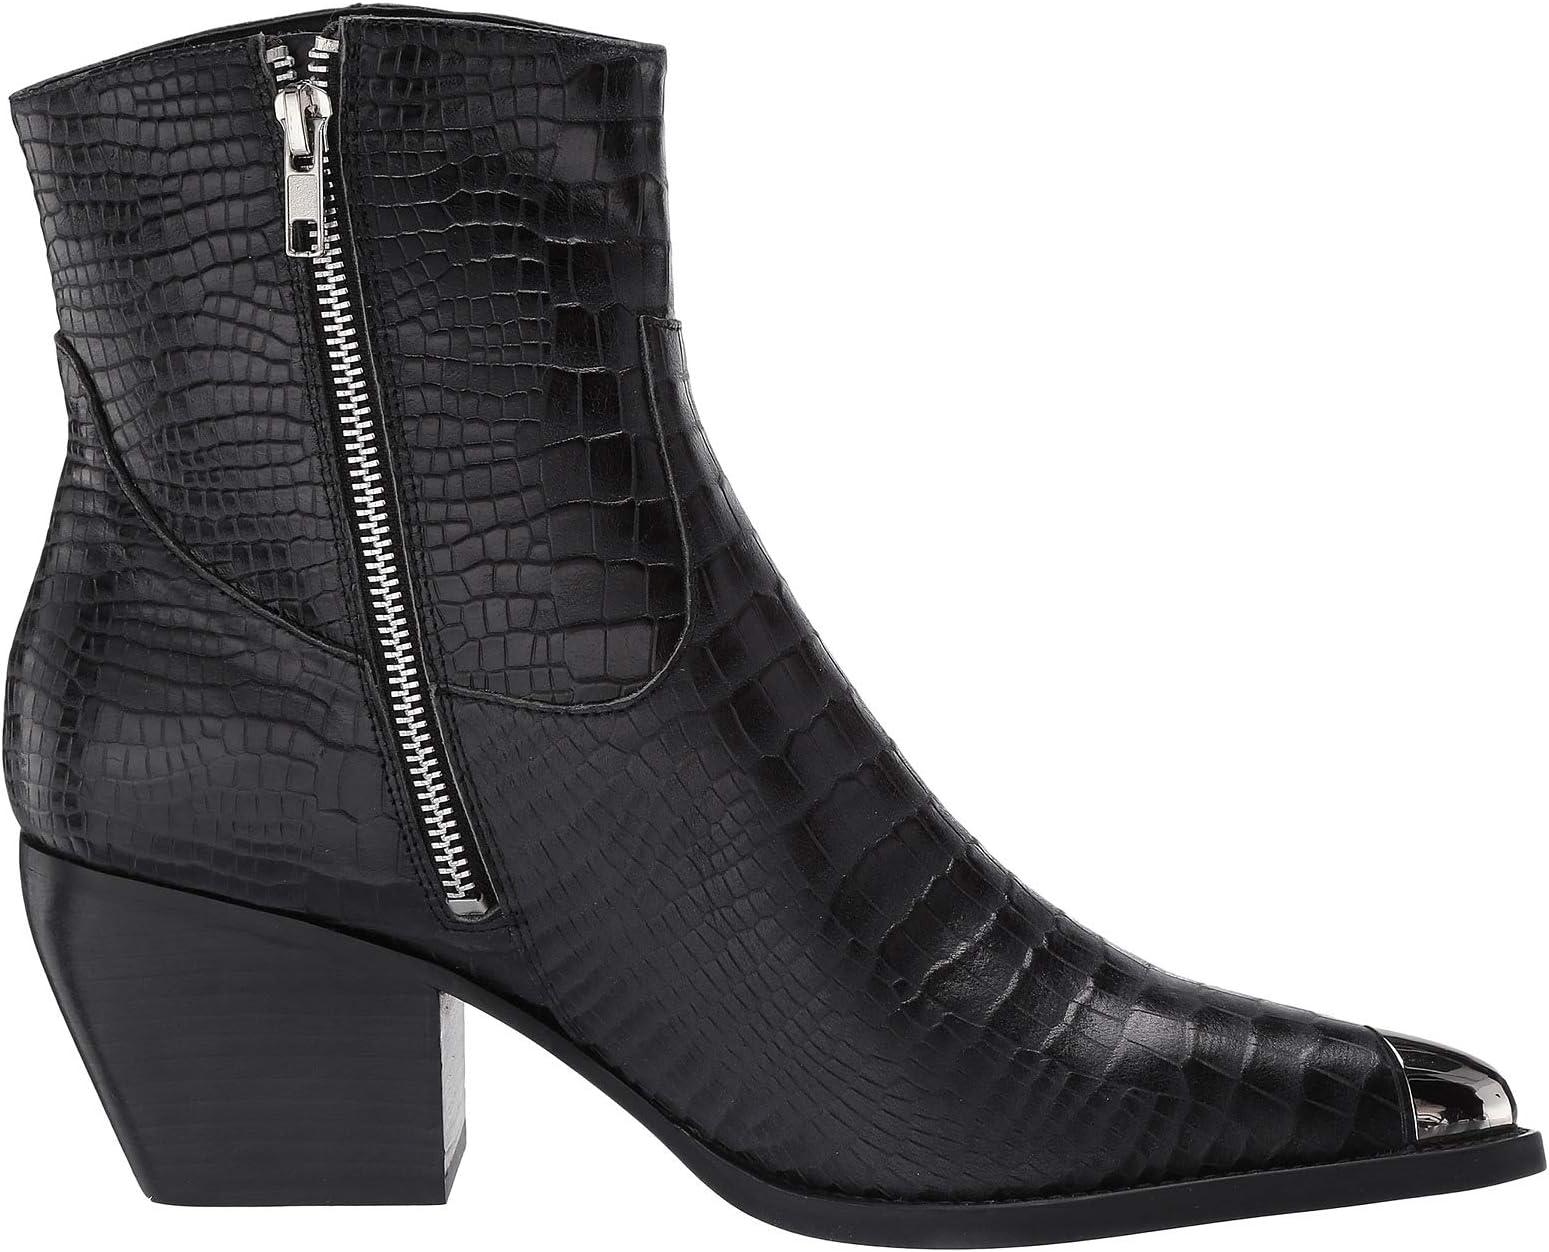 Tony Bianco Presley | Women's shoes | 2020 Newest